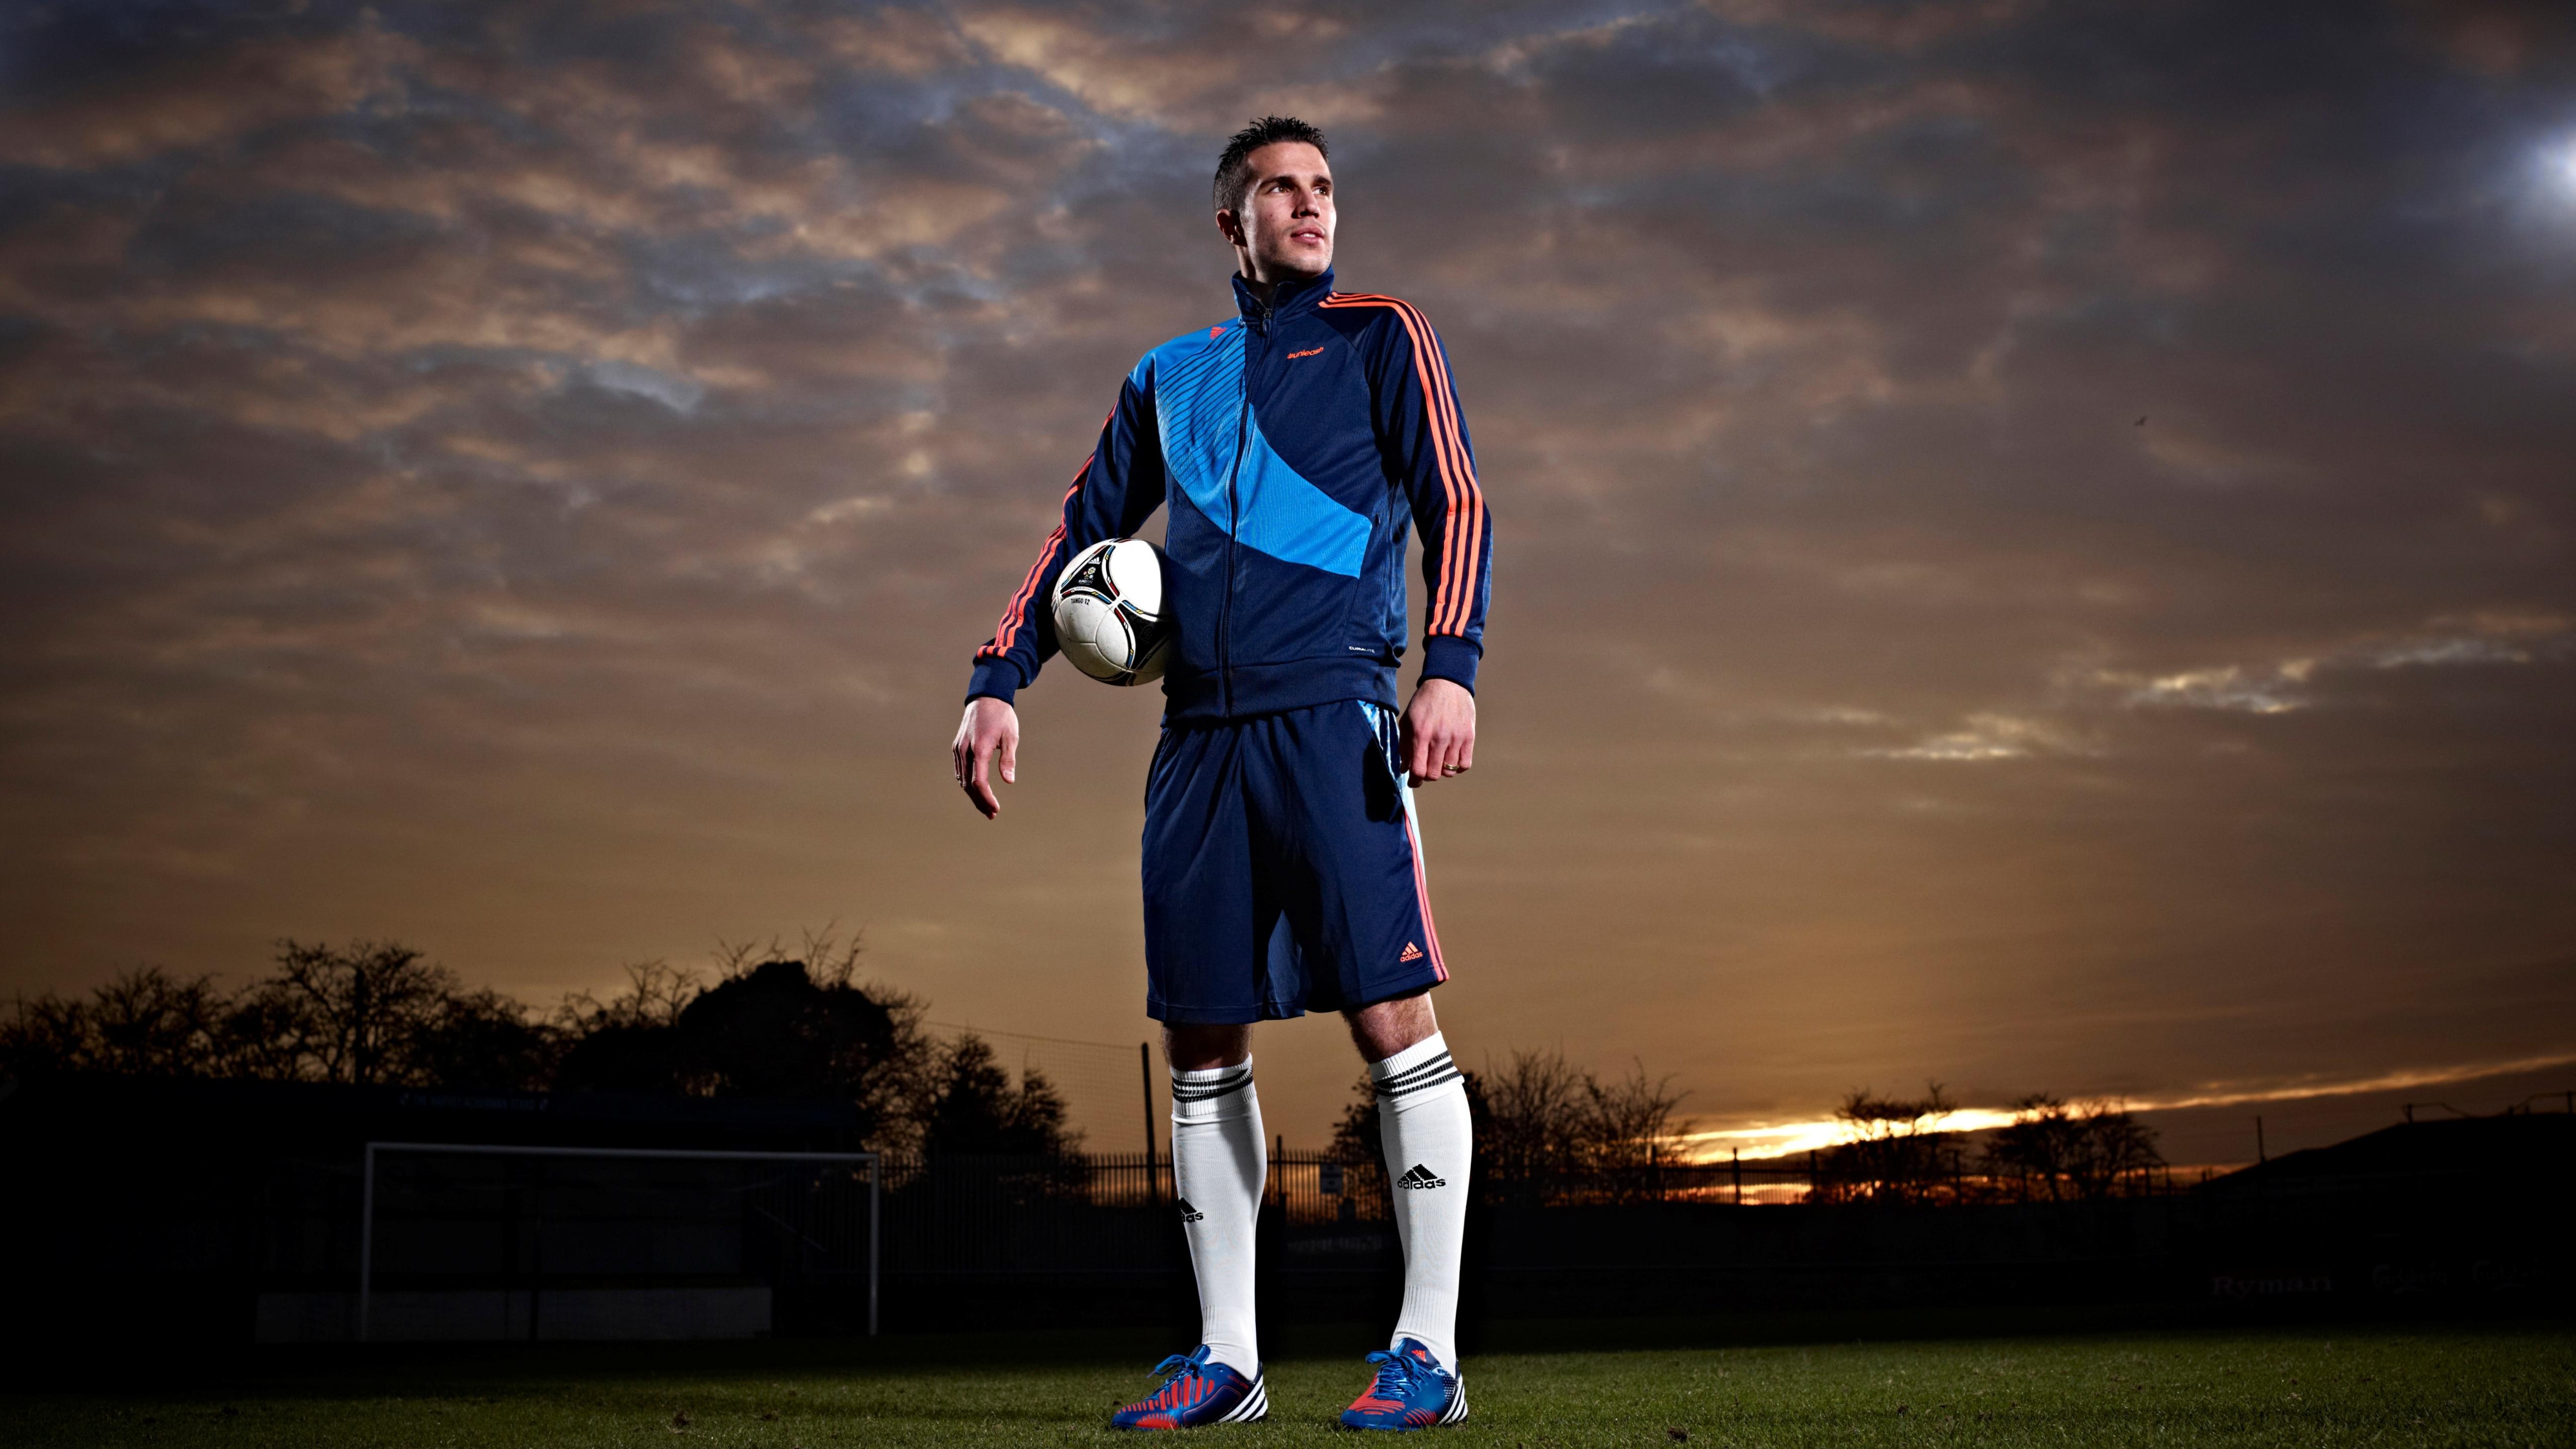 5120x2880 Robin Van Persie Manchester United Footballer 5k